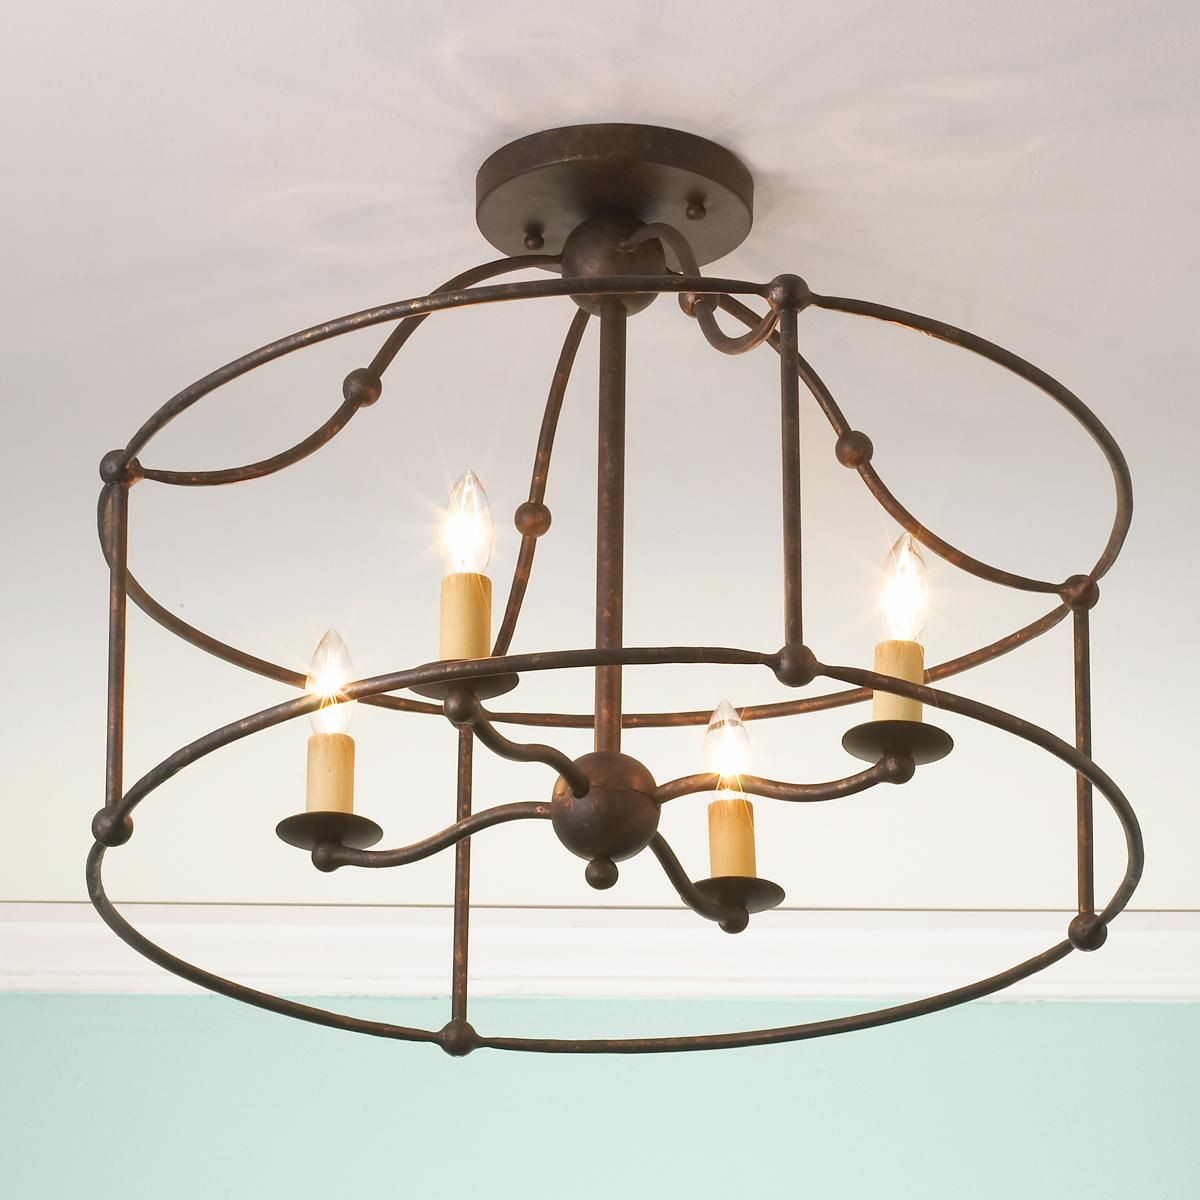 Wrought Iron Convertible Lantern Lantern Ceiling Lights Ceiling